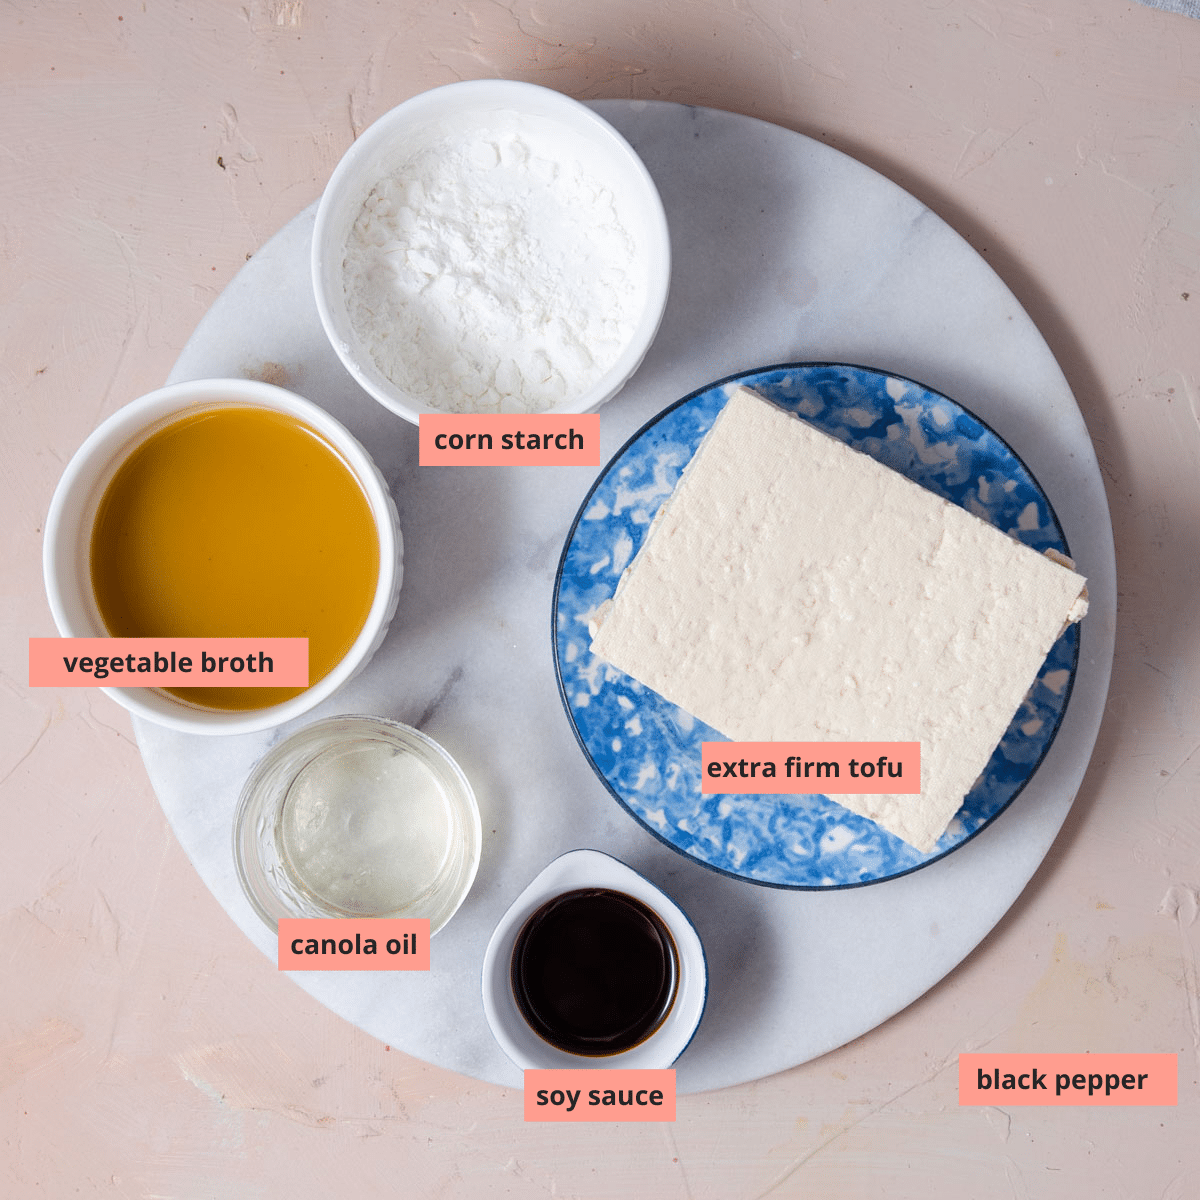 Labeled ingredients to make baked tofu